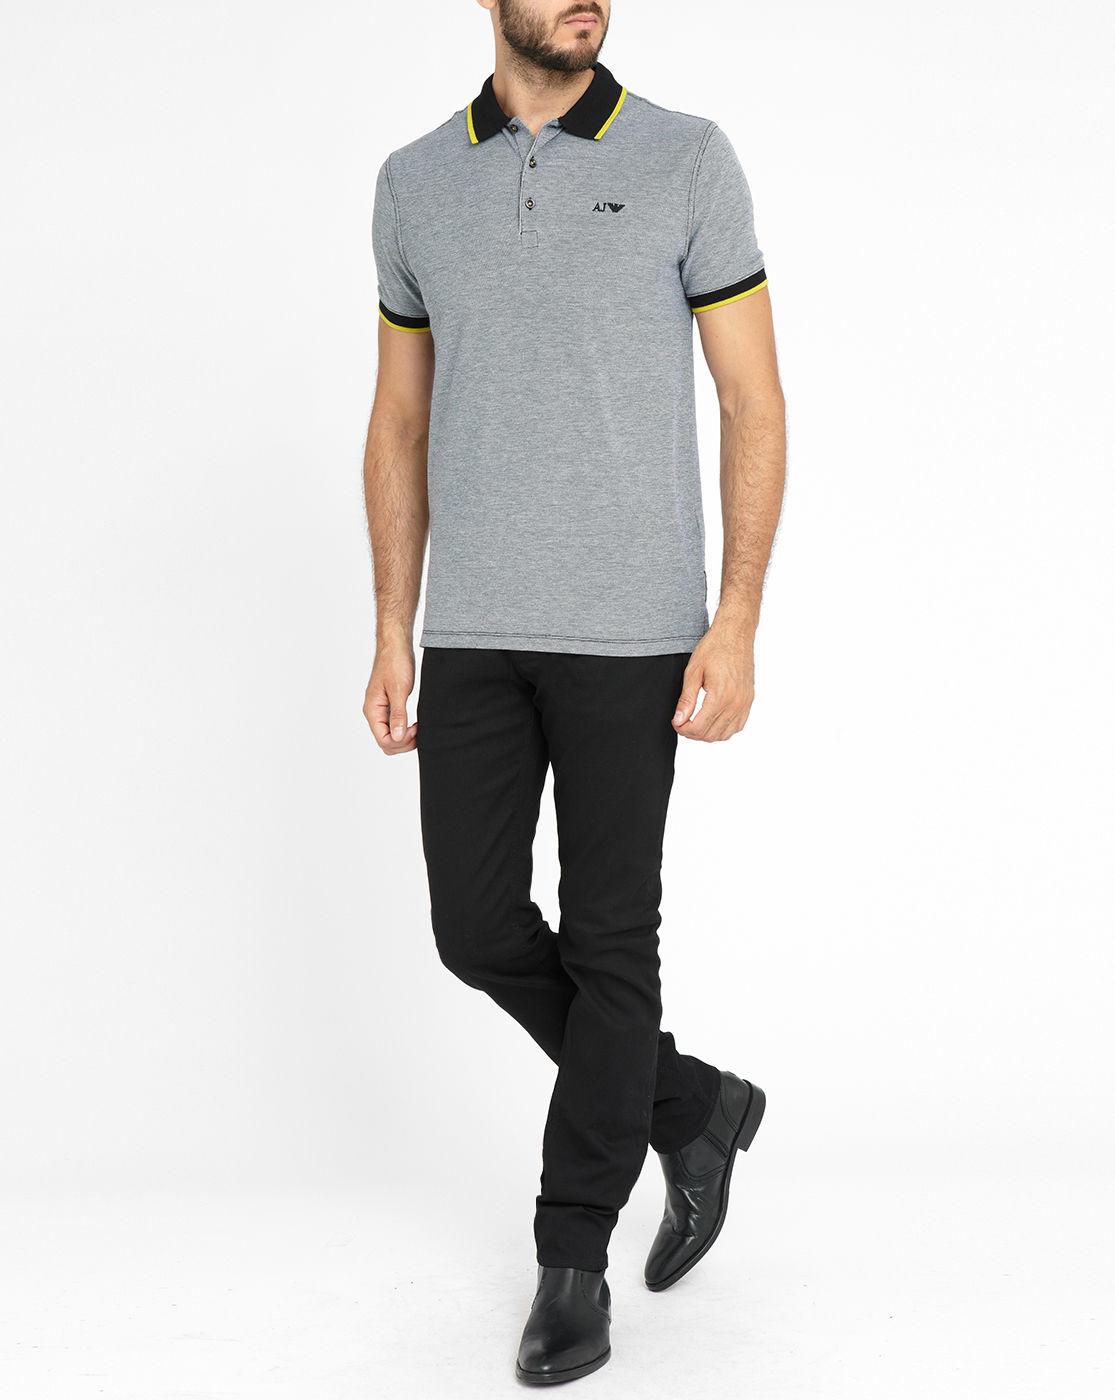 Armani jeans marled grey contrasting black yellow collar for Gray dress shirt black pants